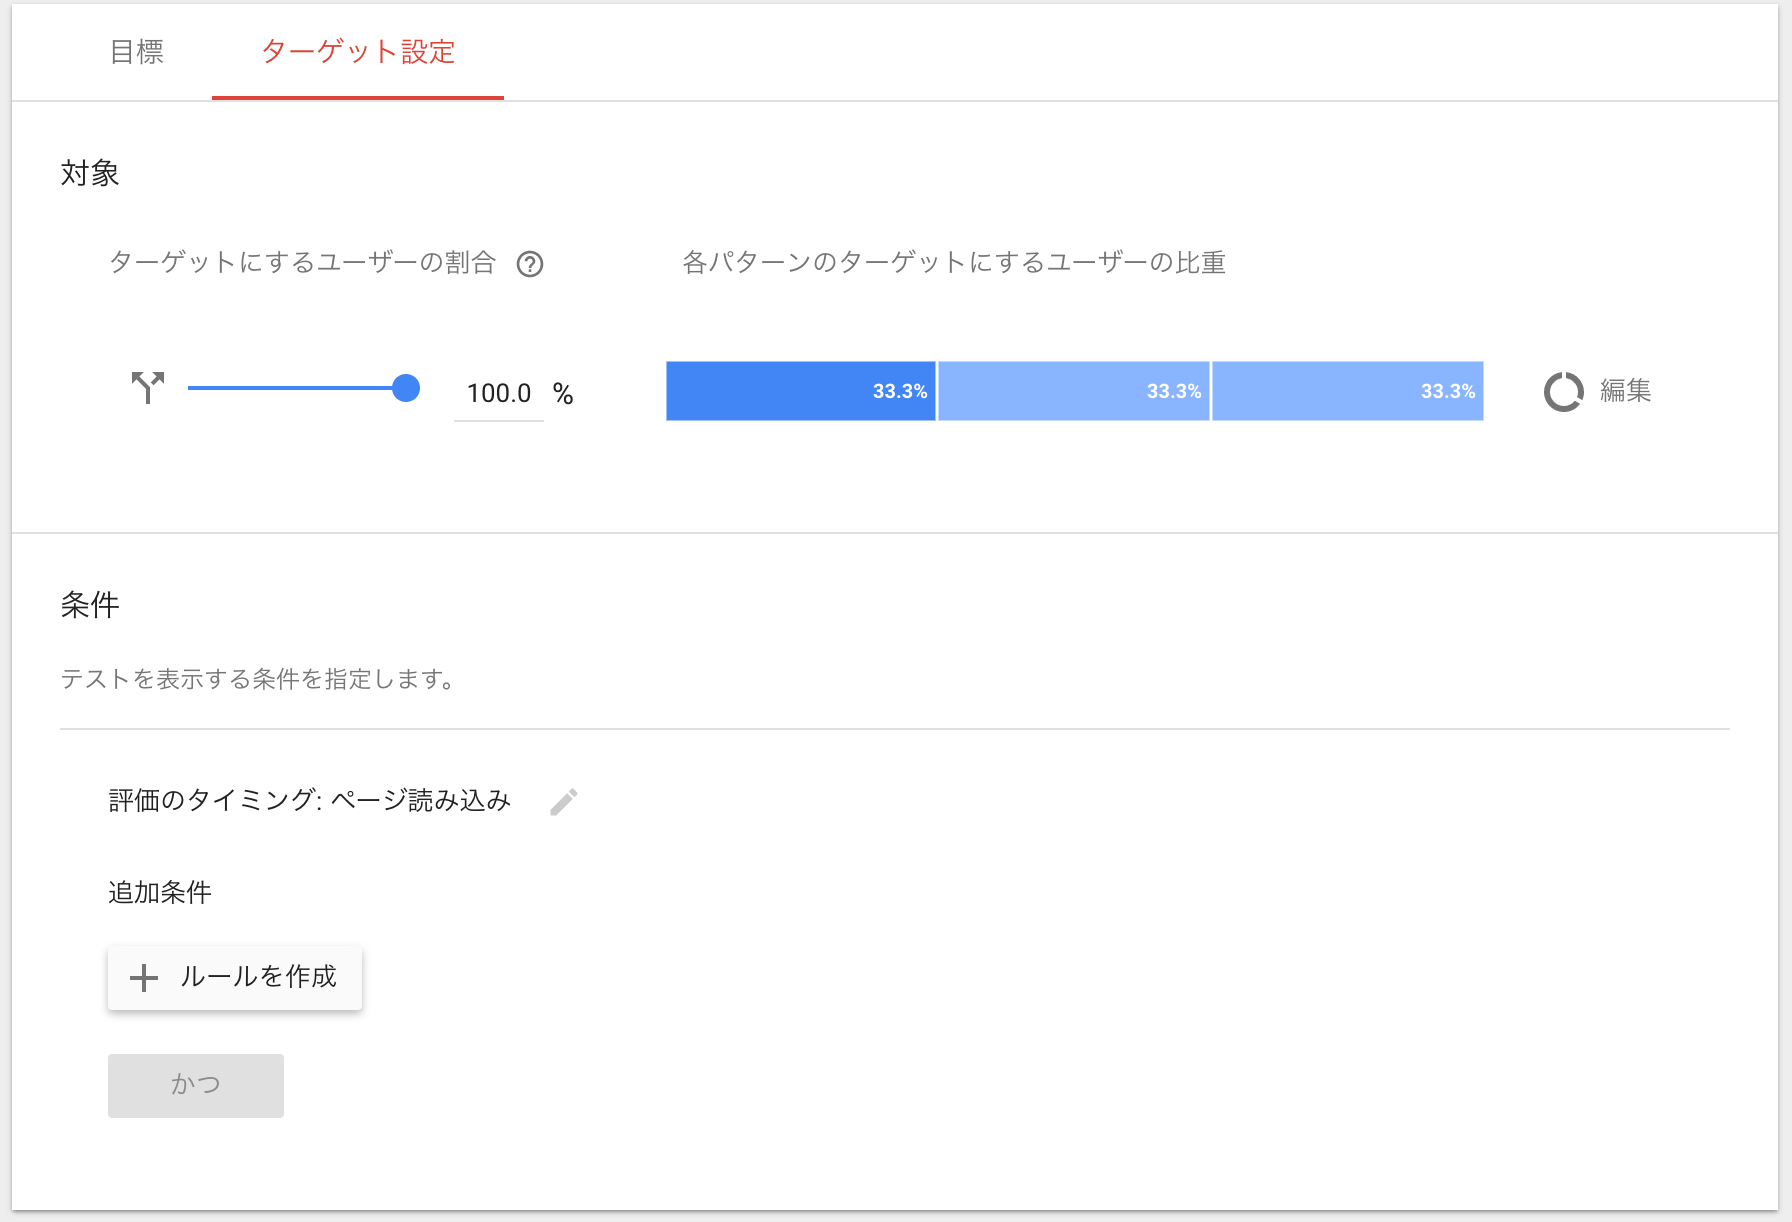 sampleテスト___詳細_-_オプティマイズ.png